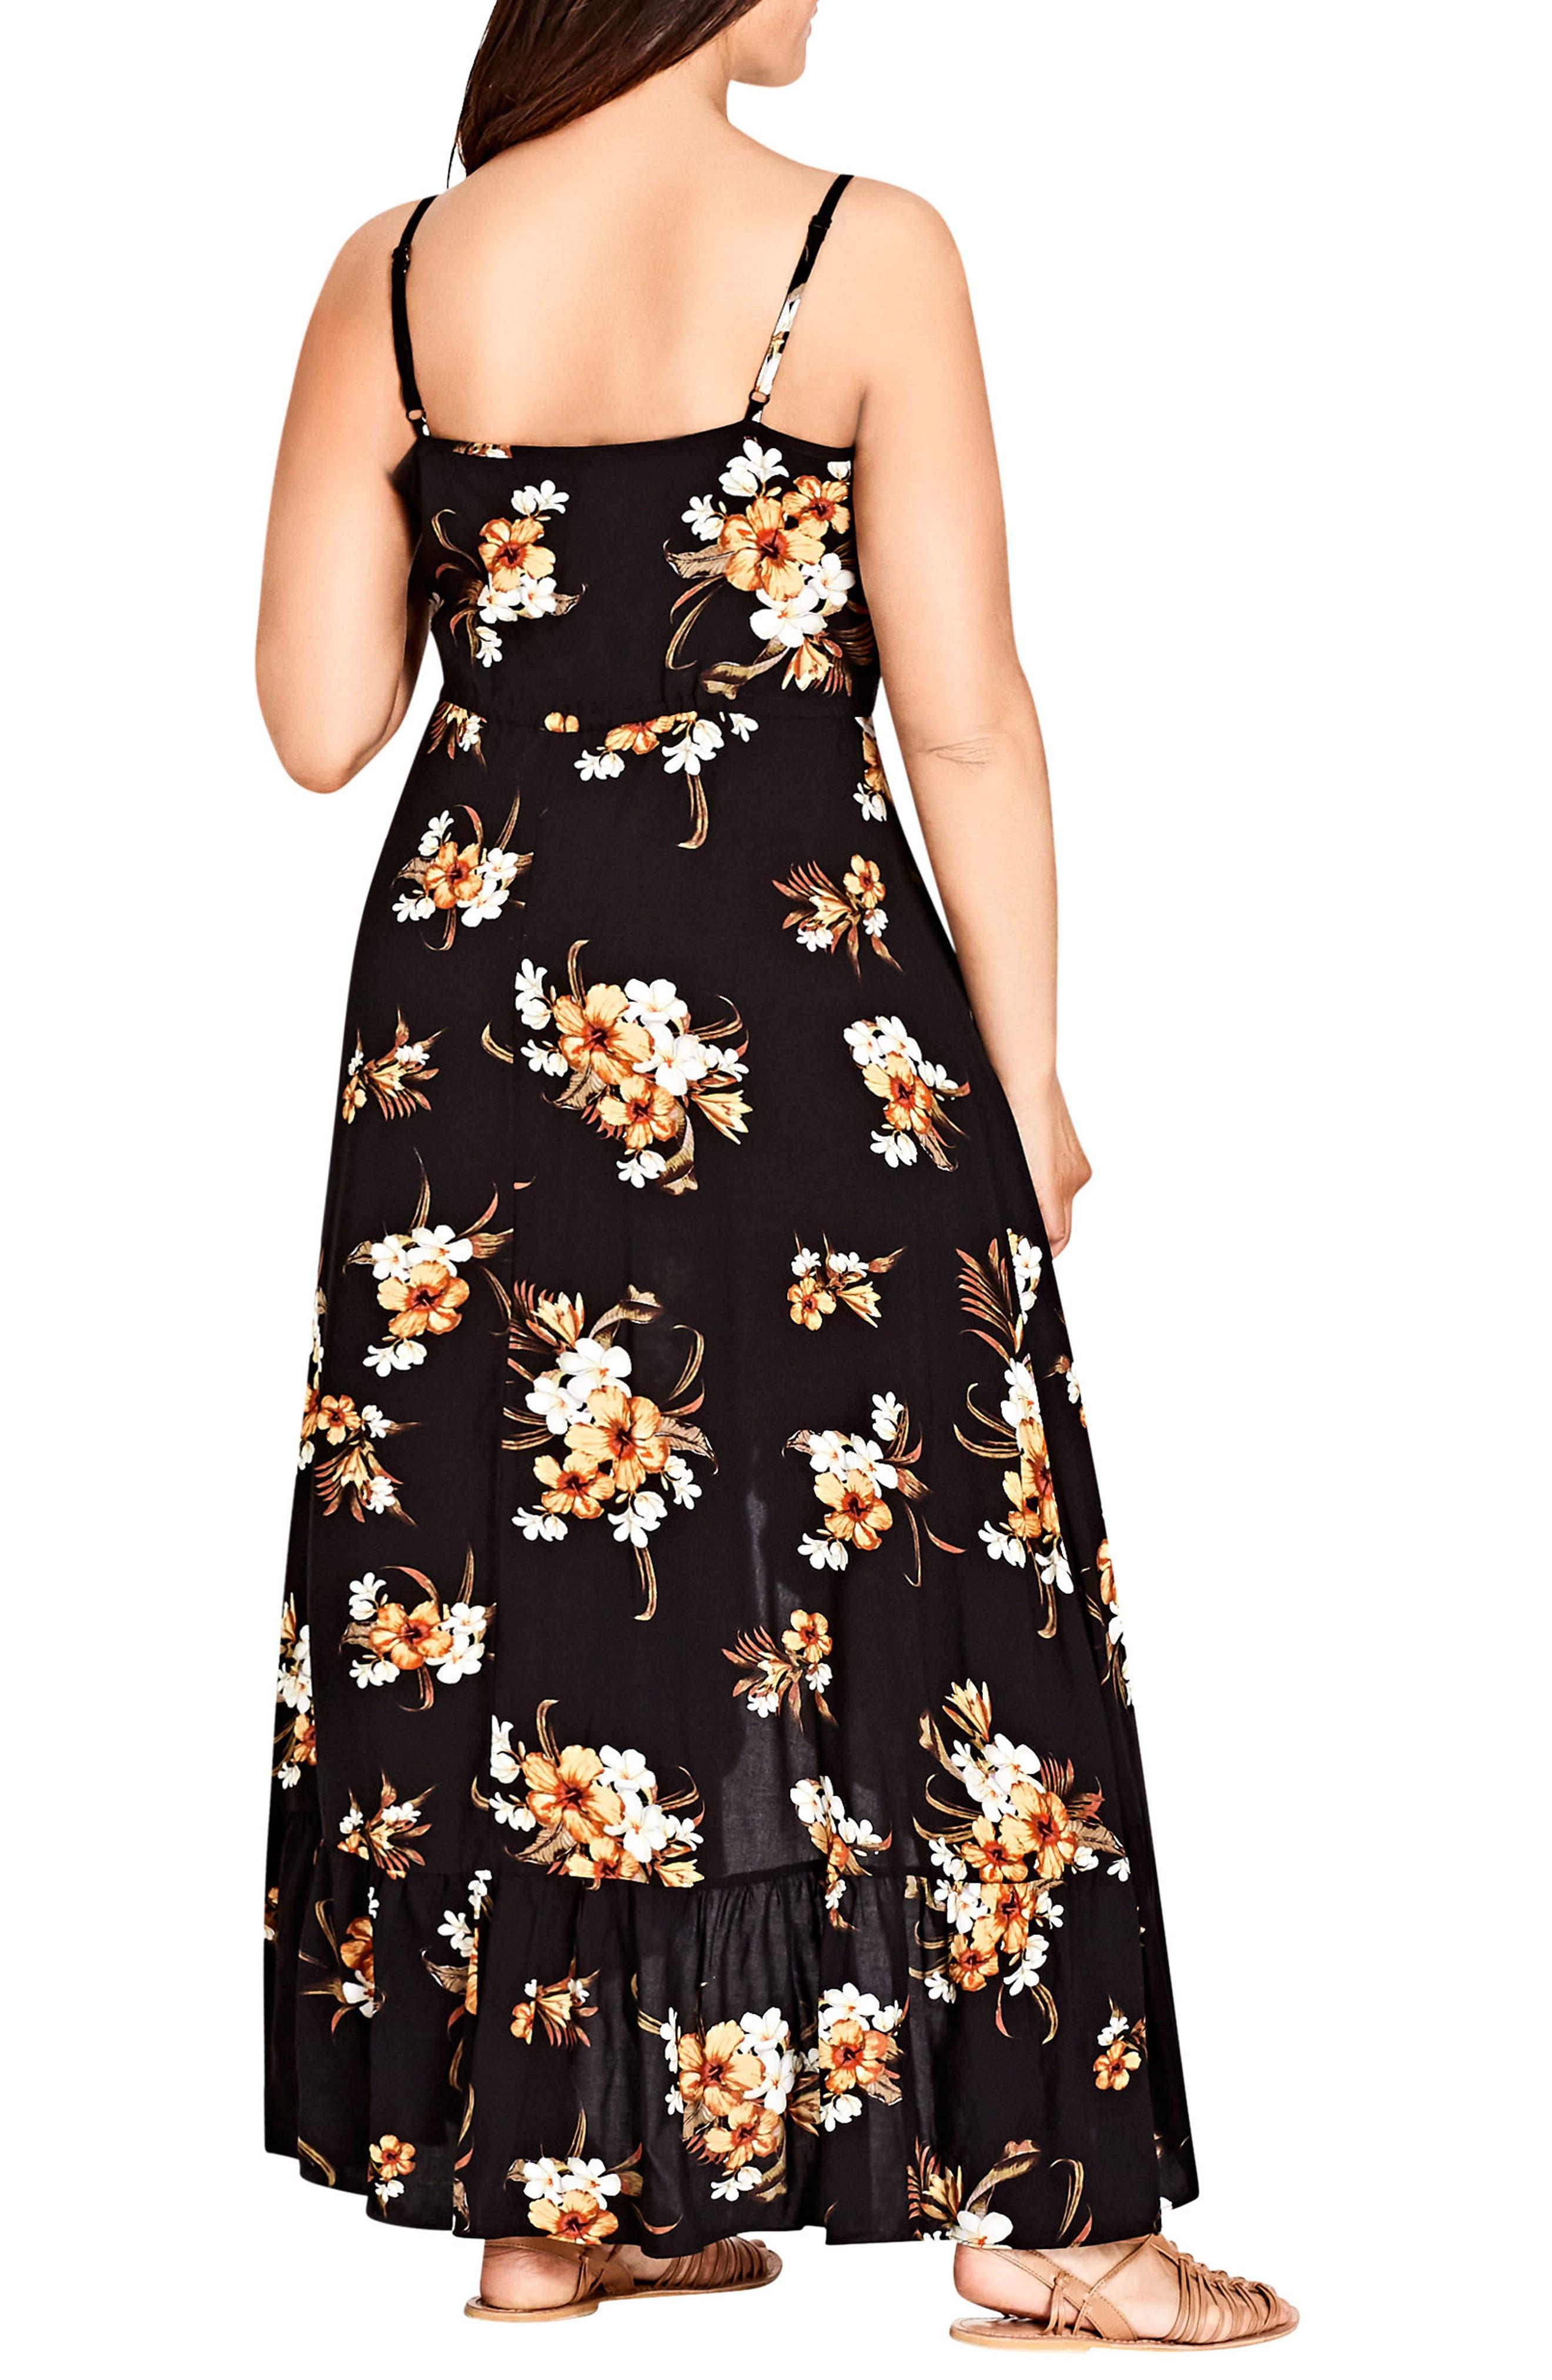 Aruba Floral Maxi Dress,                             Alternate thumbnail 2, color,                             BLACK PRINT